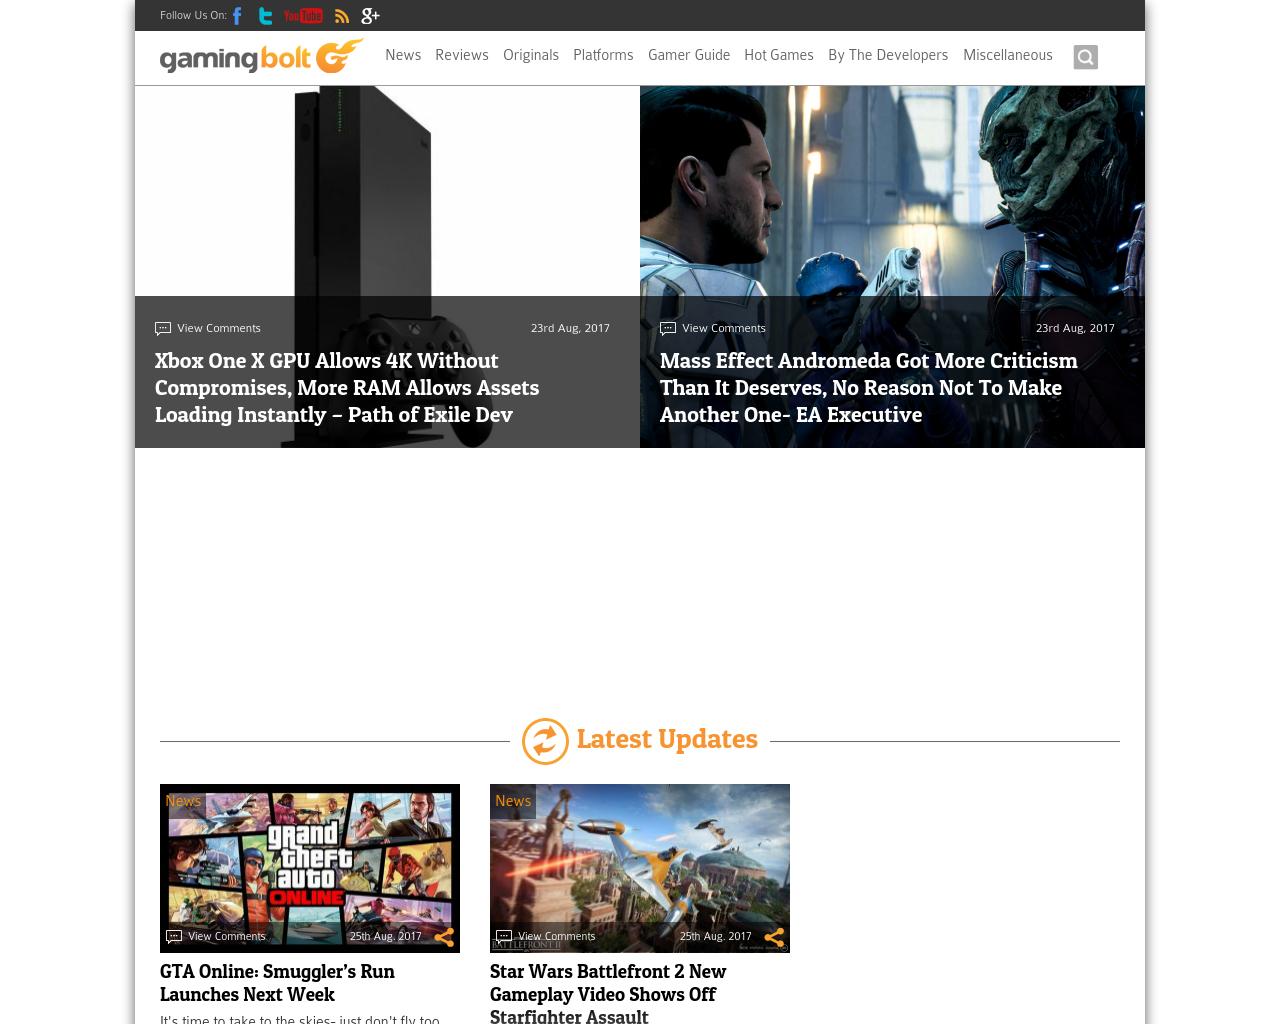 GamingBolt-Advertising-Reviews-Pricing